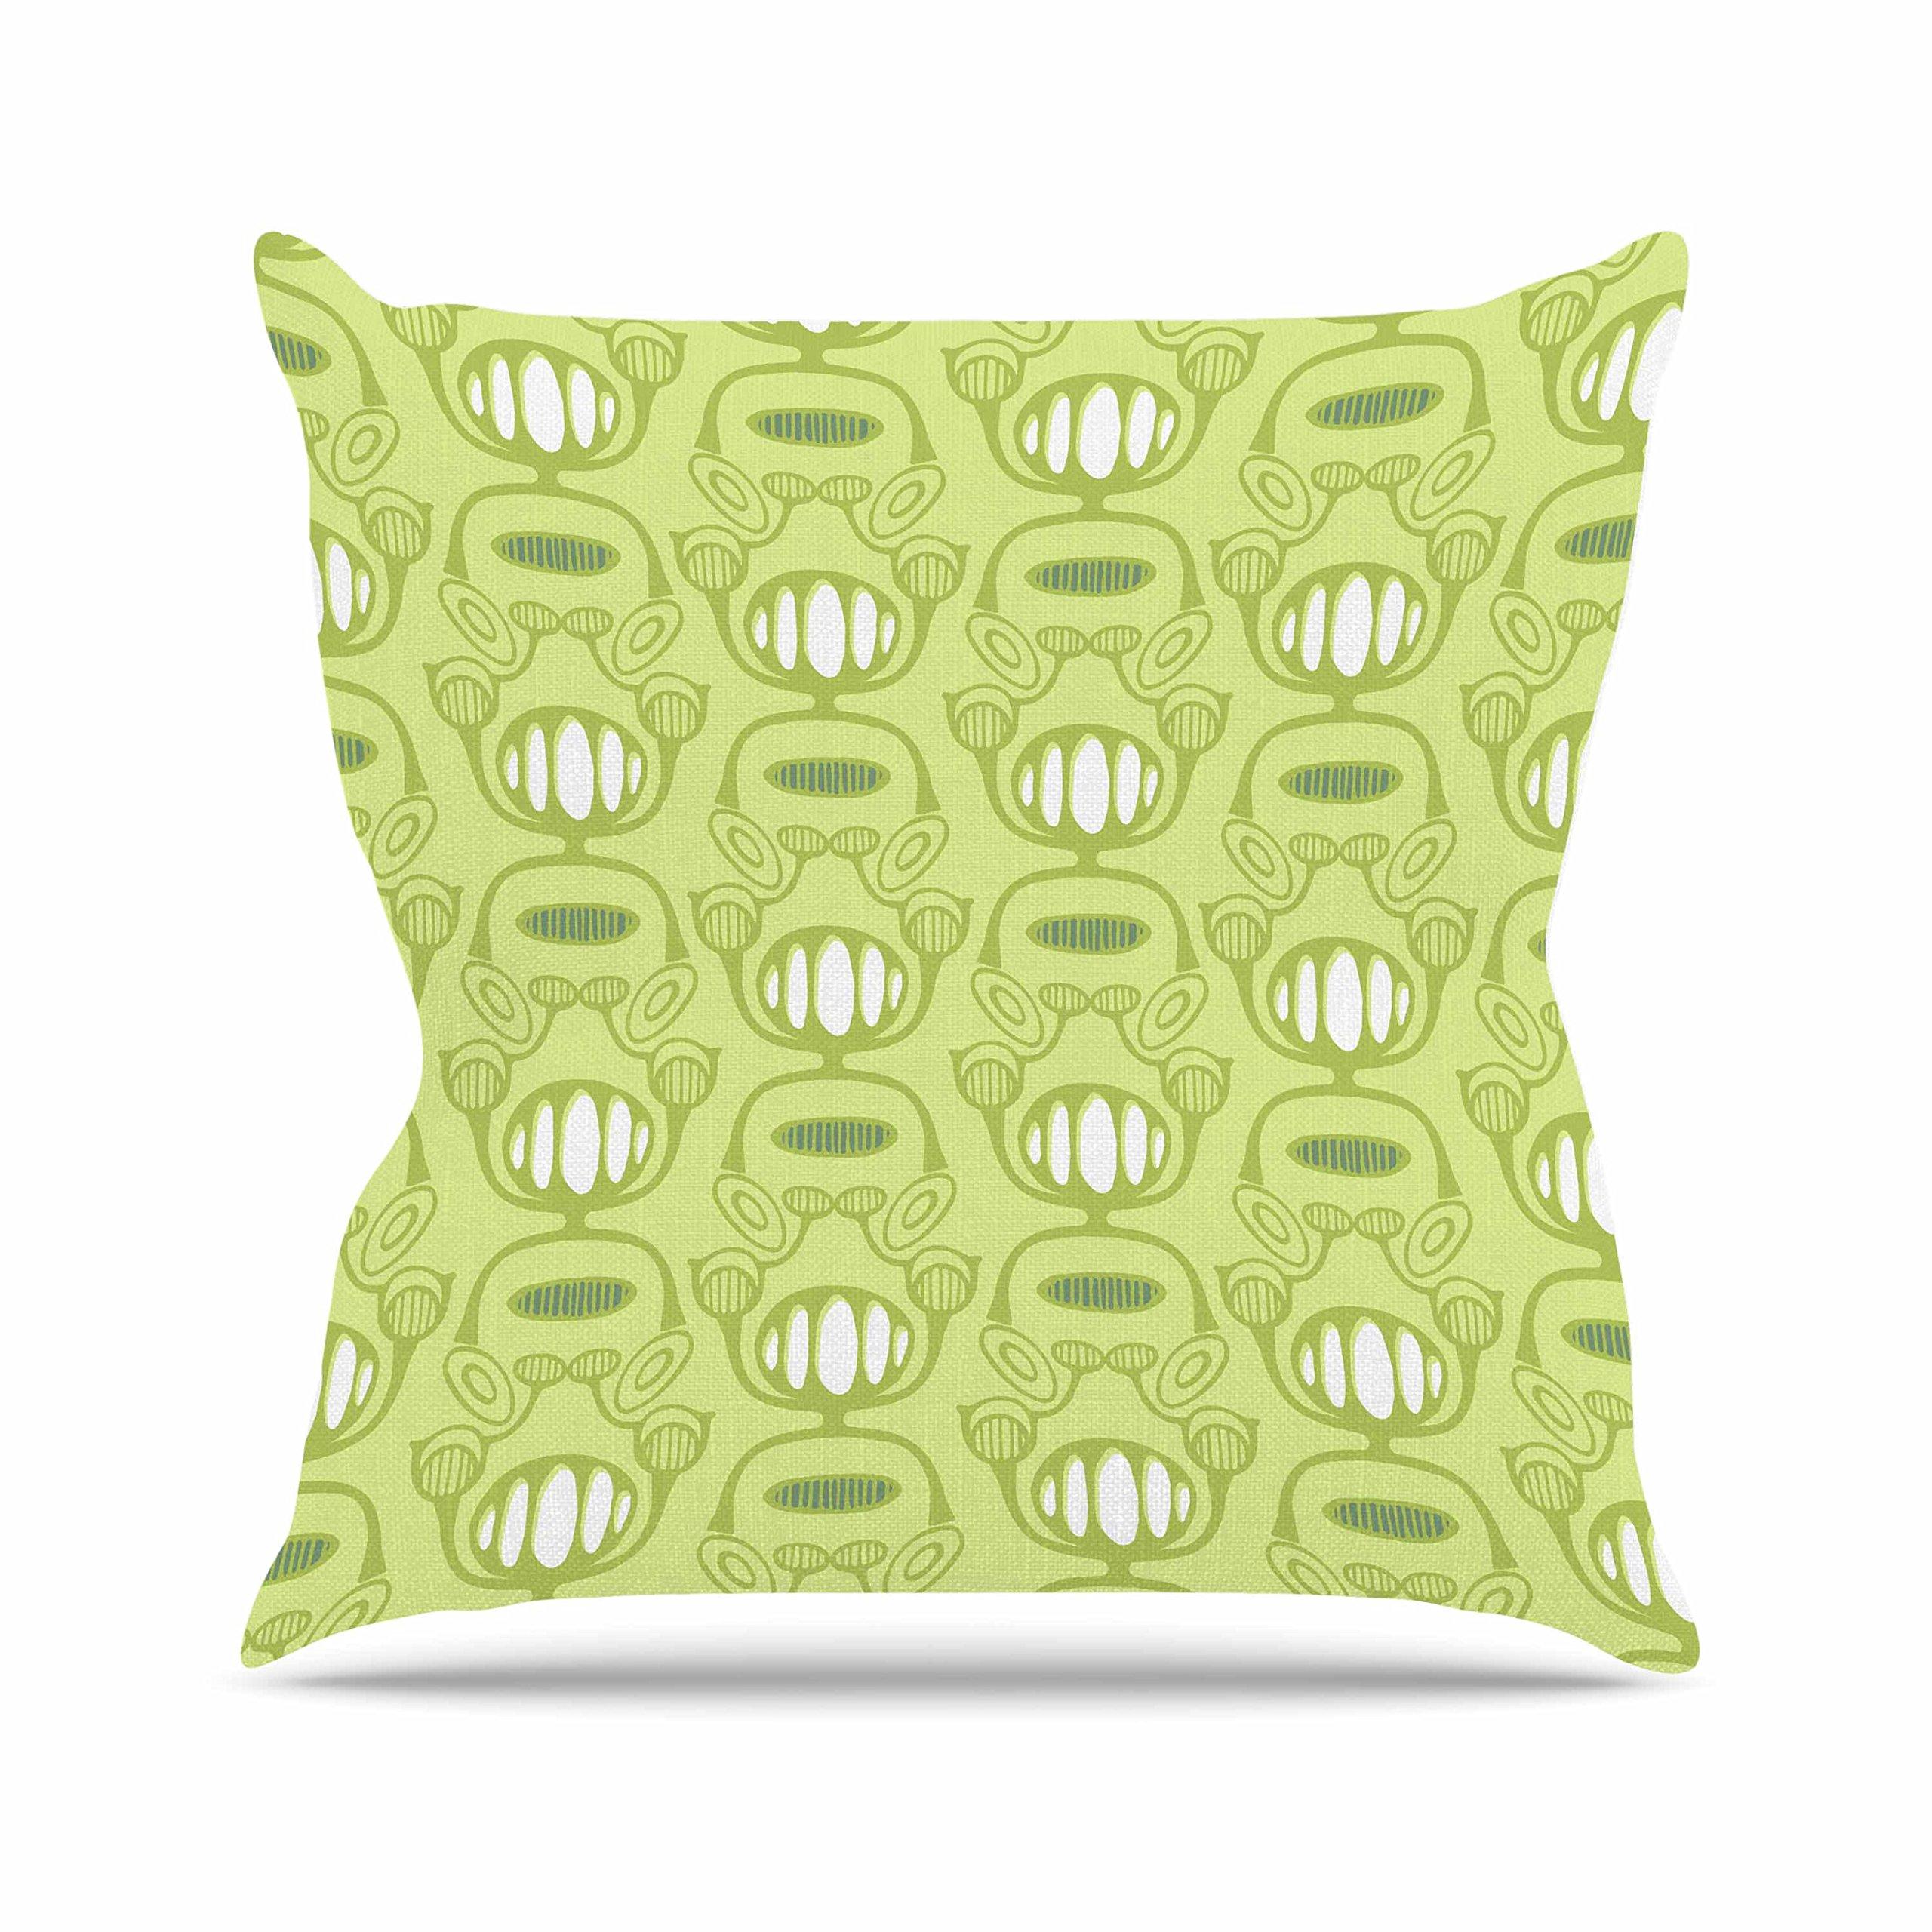 Kess InHouse Holly Helgeson Flower Power Green Pattern Outdoor Throw Pillow, 18'' x 18''